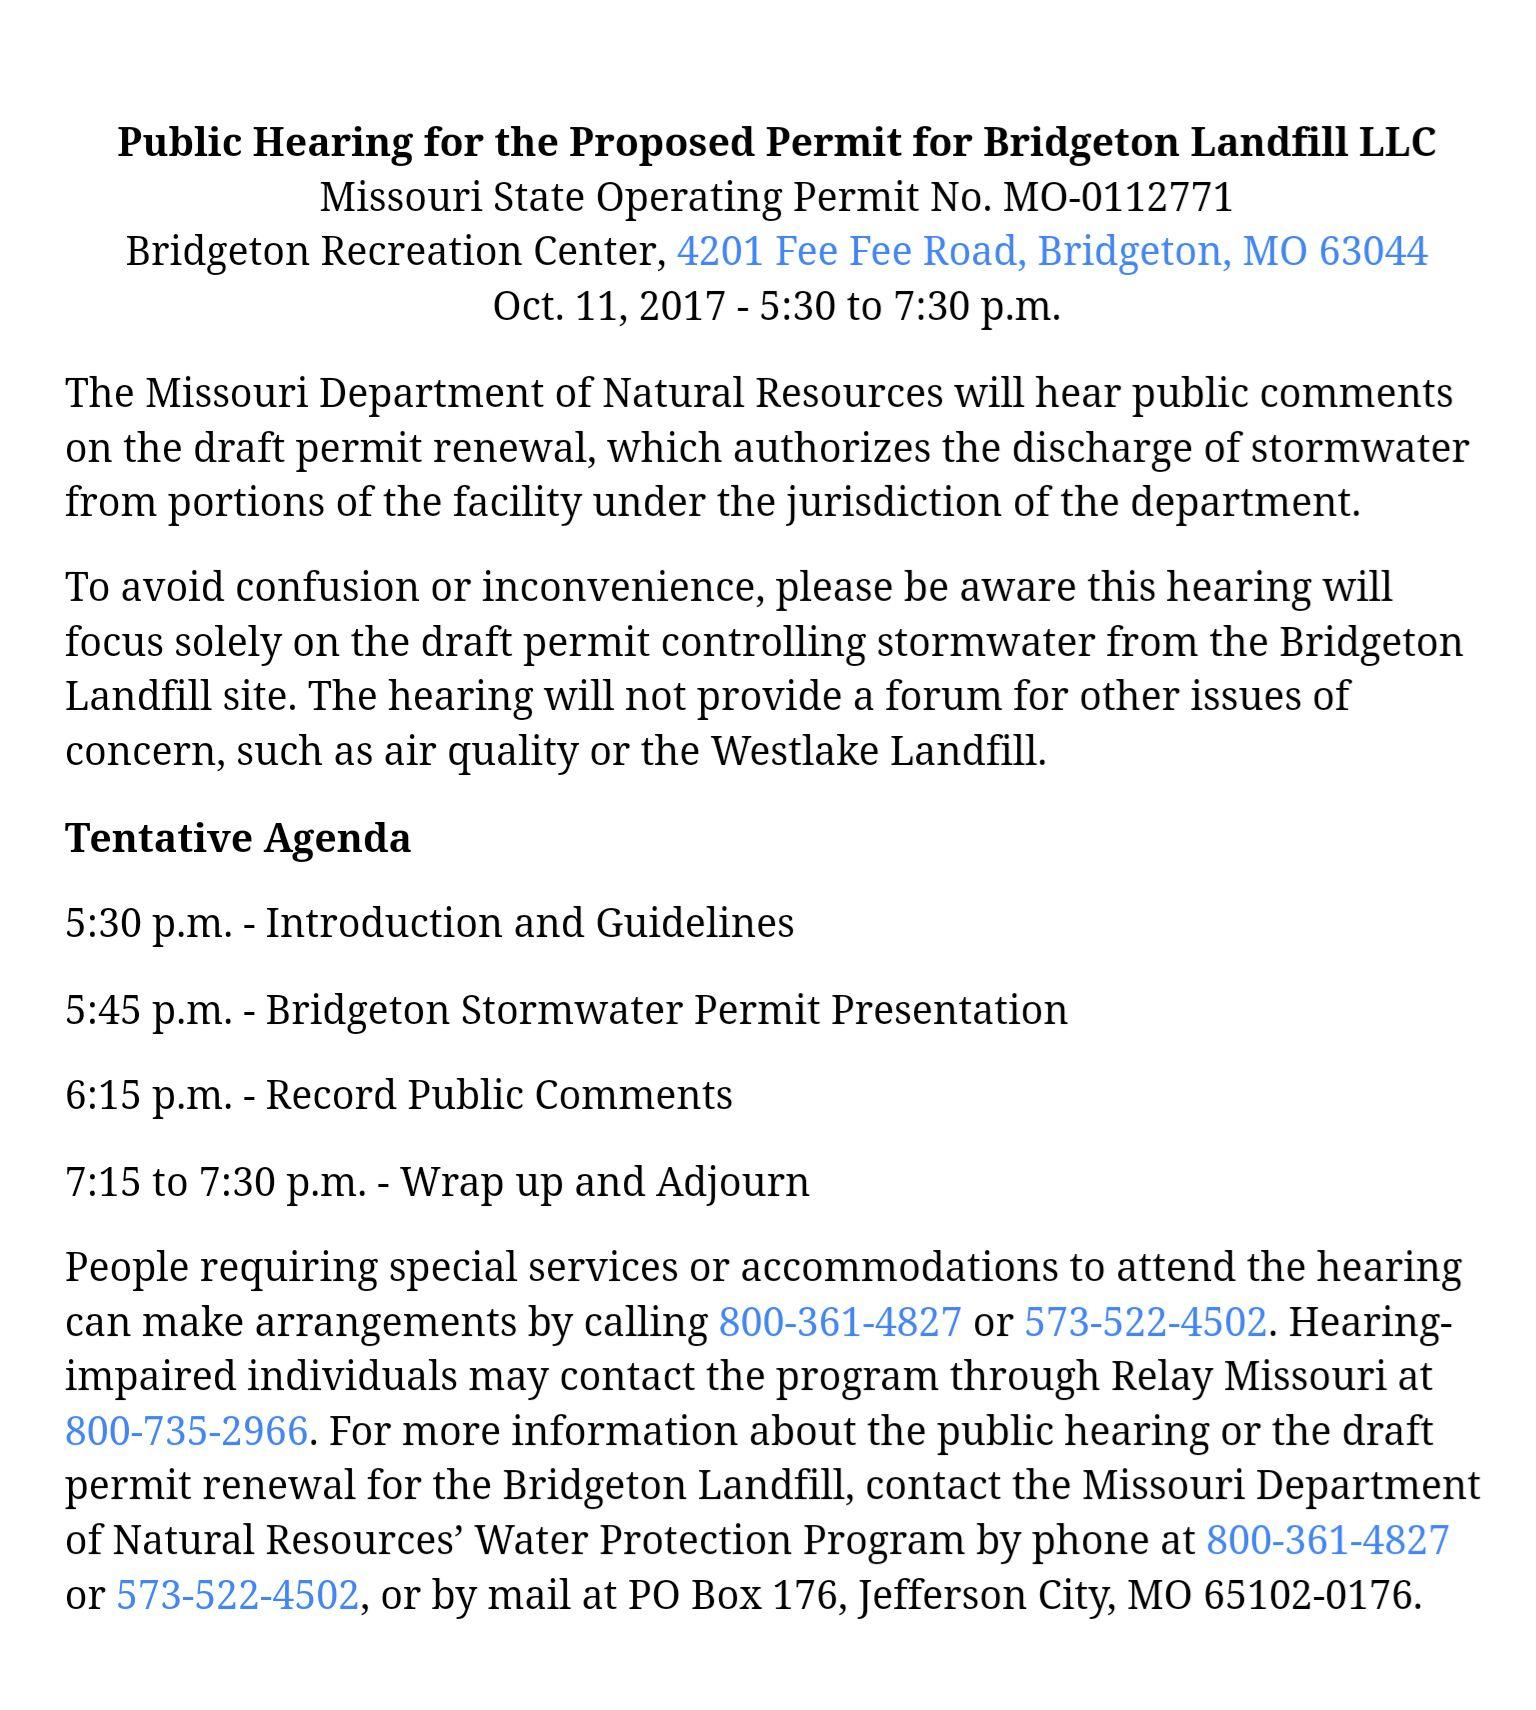 Public Hearing Bridgeton Landfill Permit_10-11-17